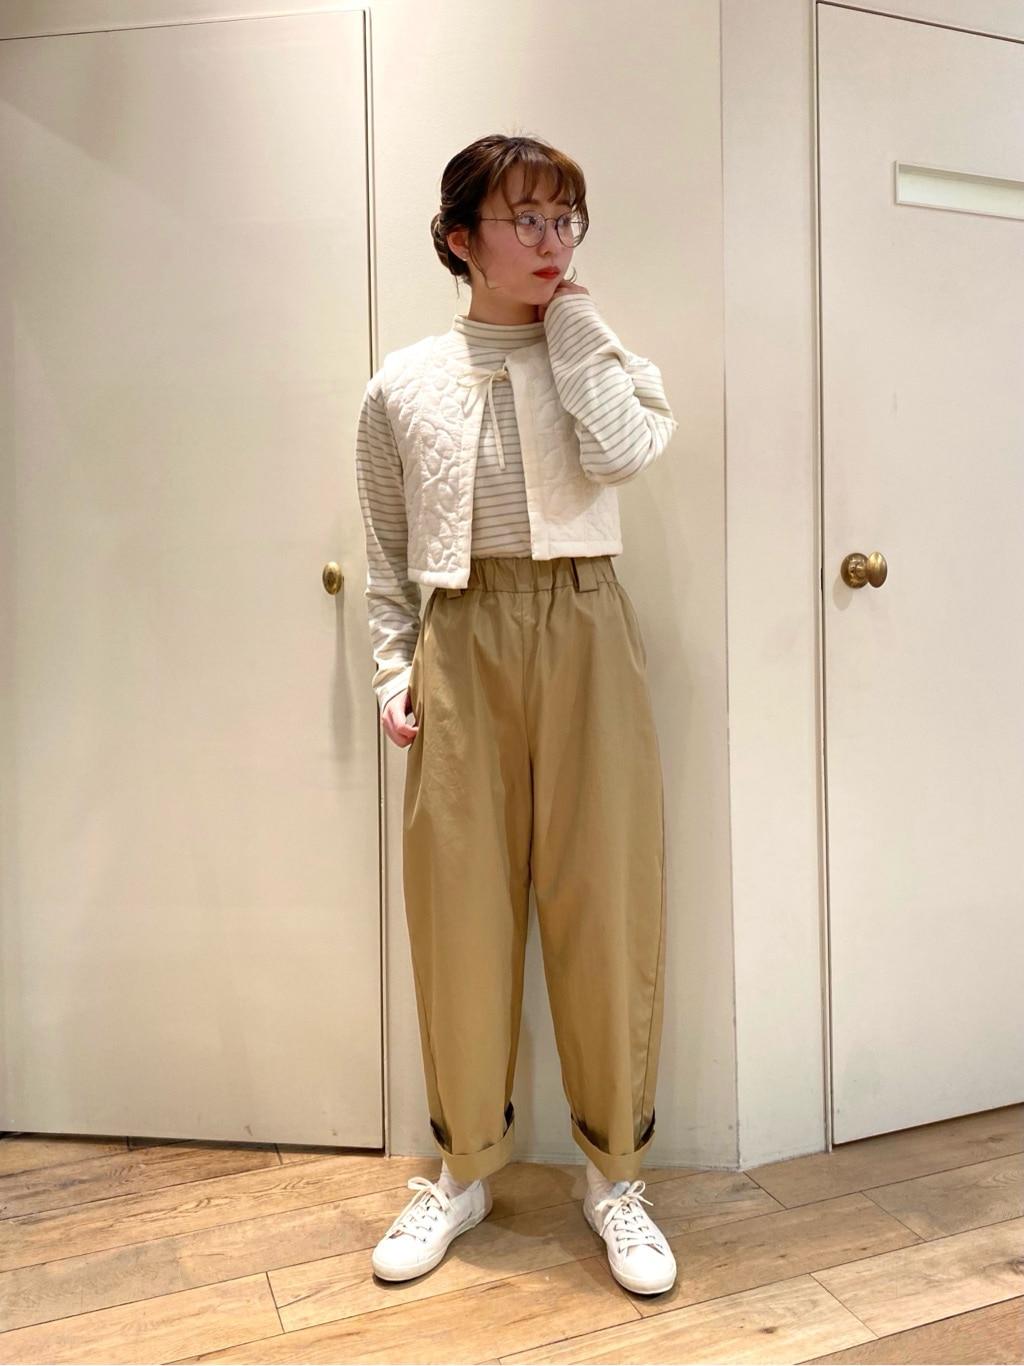 bulle de savon 新宿ミロード 身長:157cm 2021.02.14